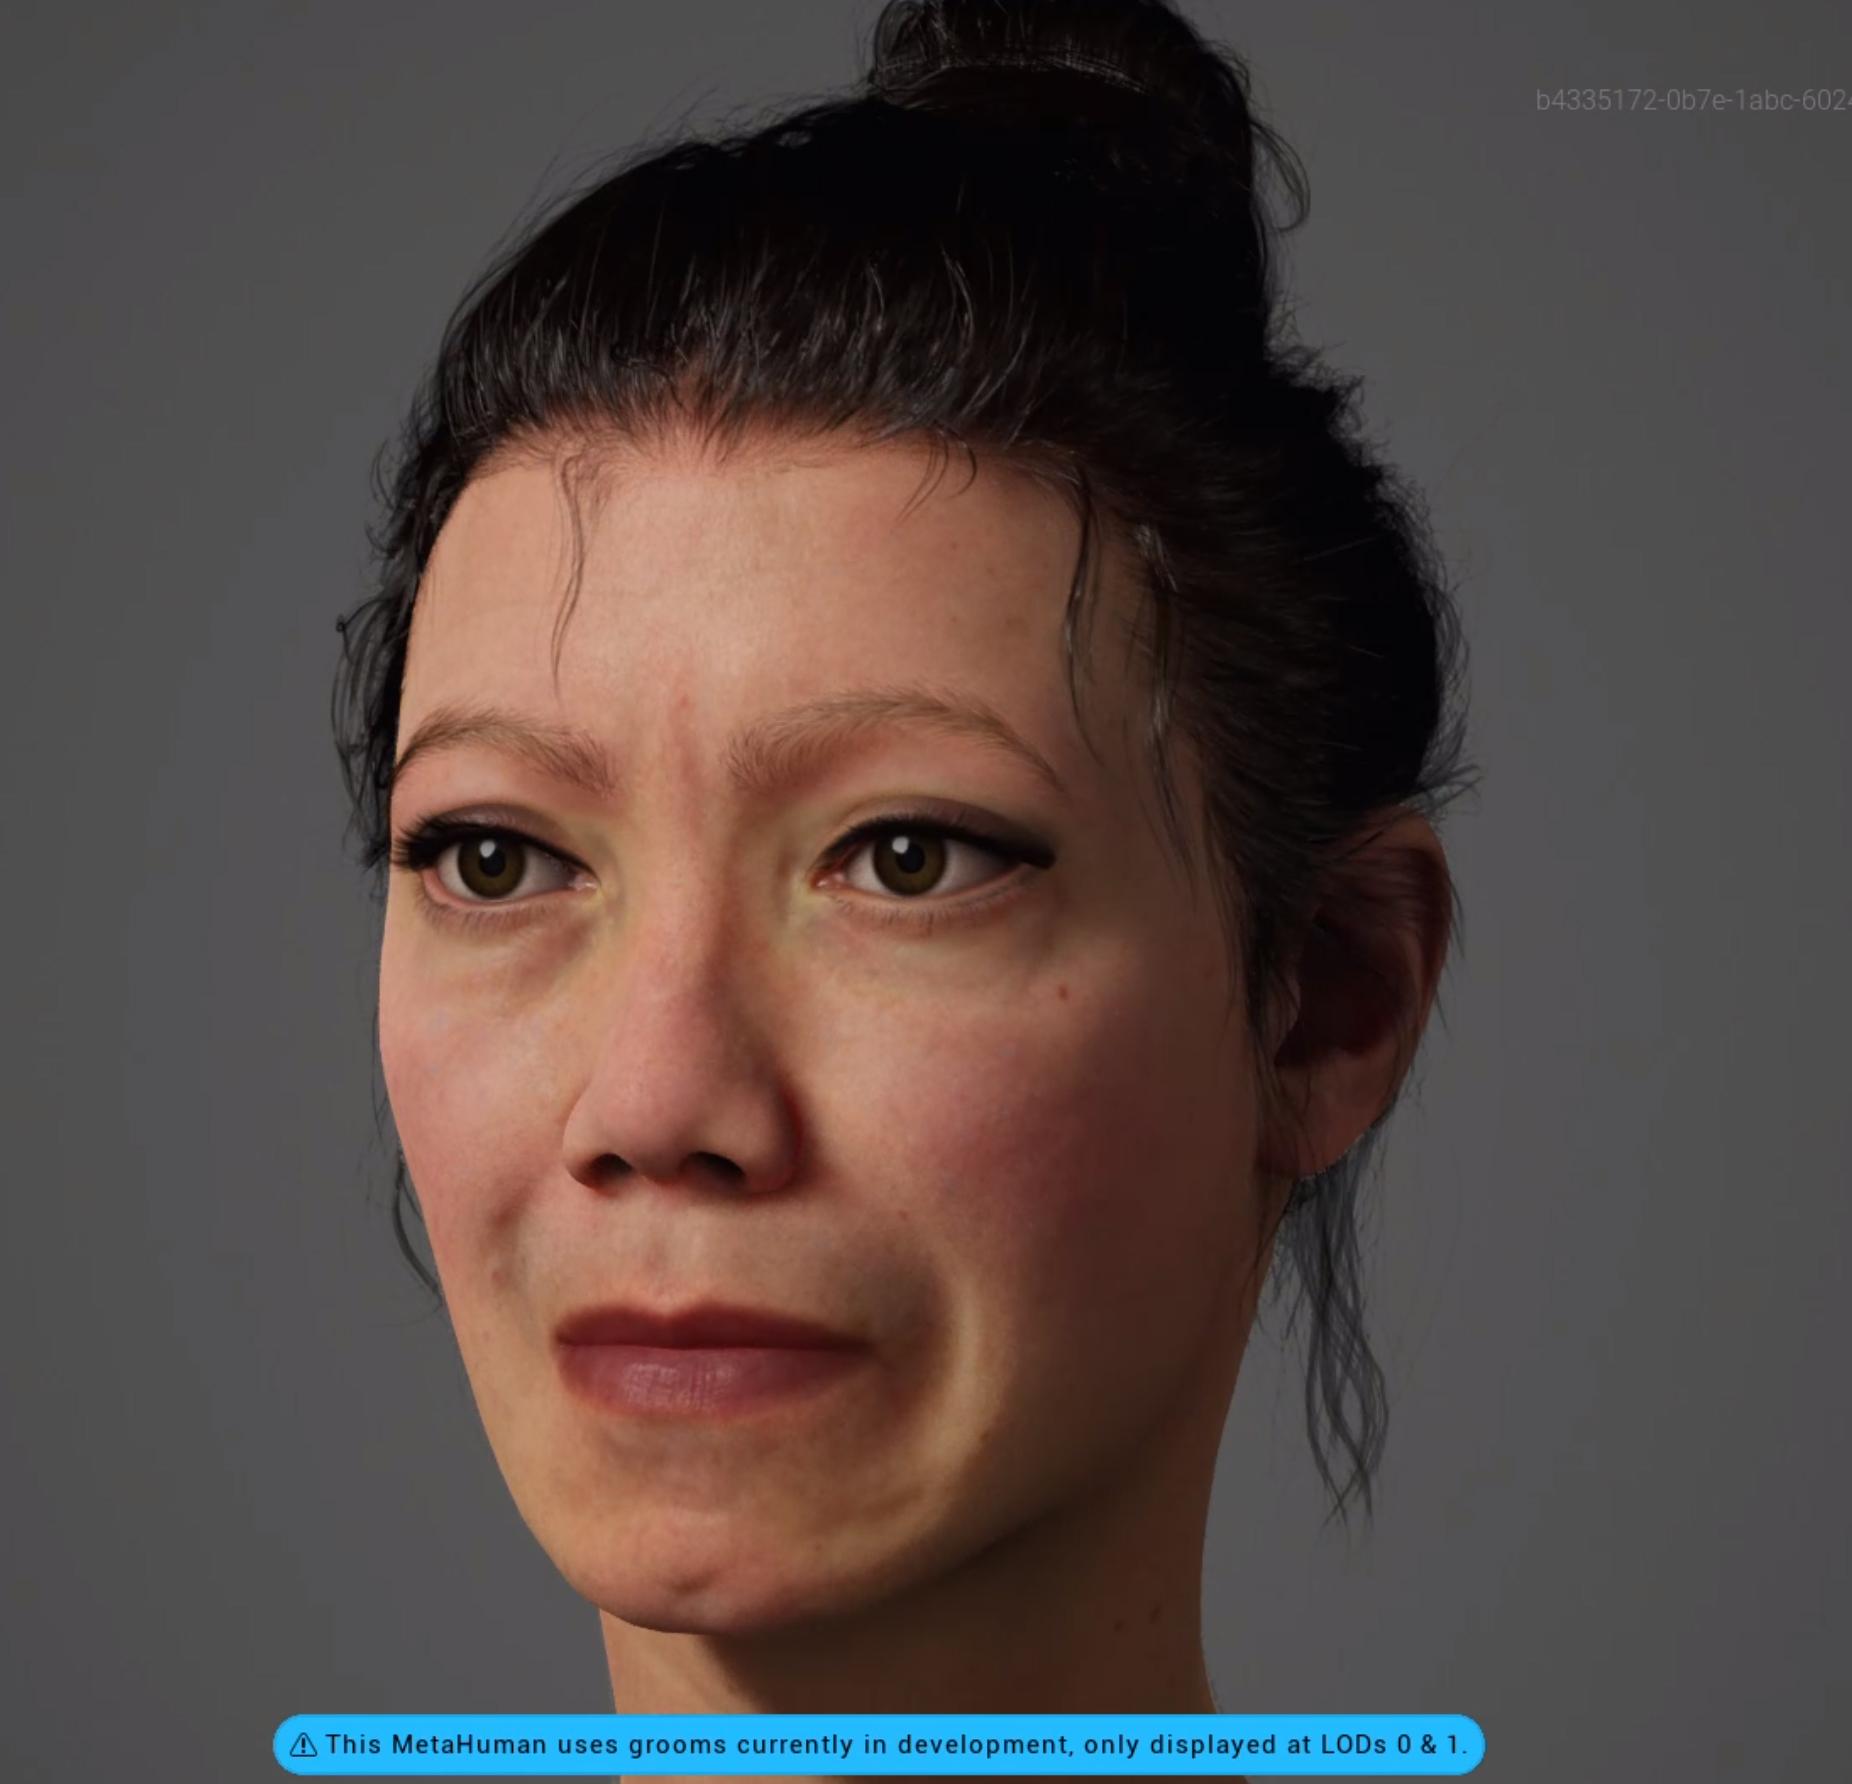 This is Amiria MetaHuman created with the Unreal Engine Metahuman Creator